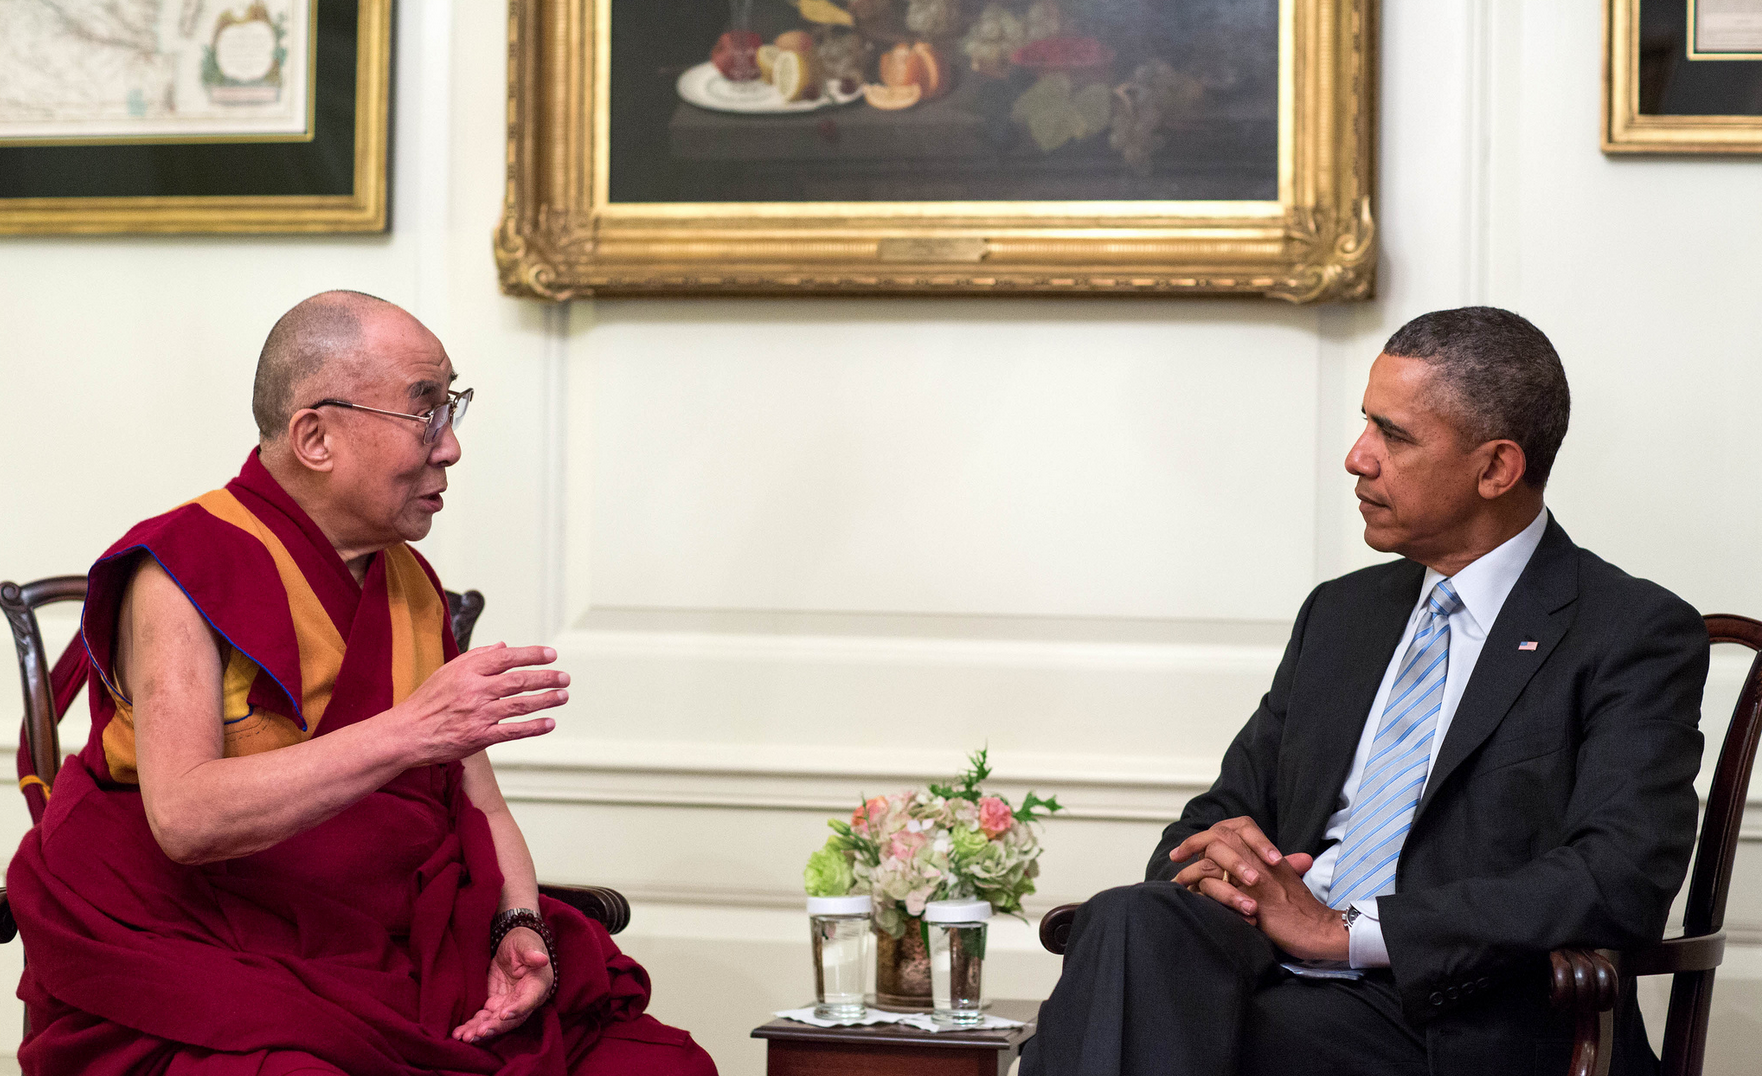 the dalai lama a political leader The 14th dalai lama is the spiritual leader of tibetan buddhism and the tibetan people in the past, dalai lamas have also served as the political leaders of tibet.